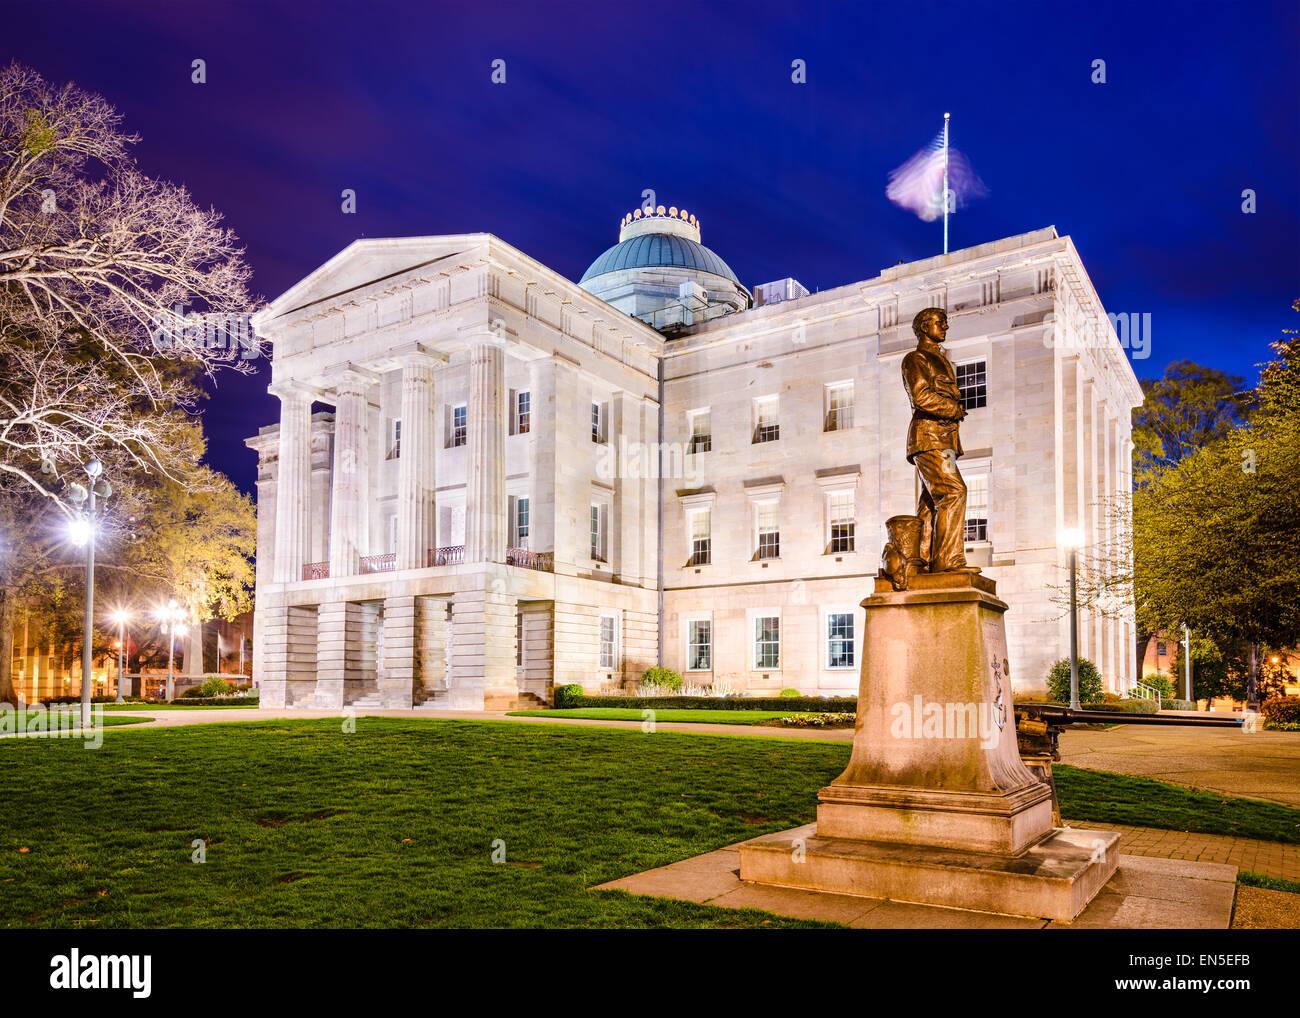 Raleigh, North Carolina, USA State Capitol Building. - Stock Image